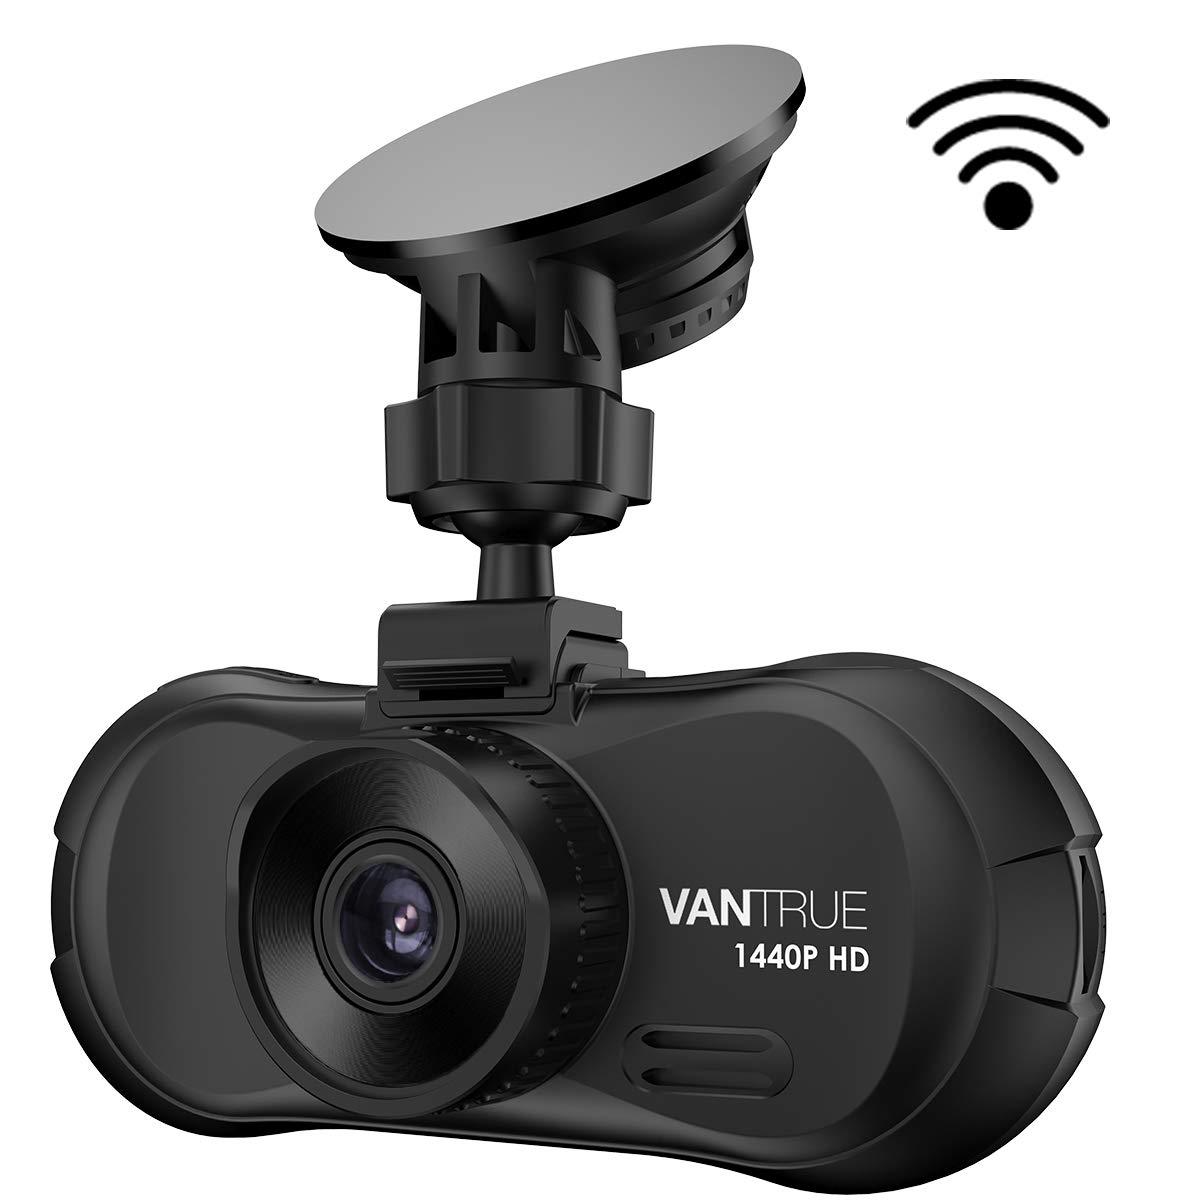 Vantrue X3 Wifi Dash Cam Super Hd 25k Dashboard Camera Loop September Powerbank Slim 80000mah 1440p Car Uber Audio Recorder With Amba A12 Chip Hdr Night Vision Parking Mode Motion Detection 170wide Angle